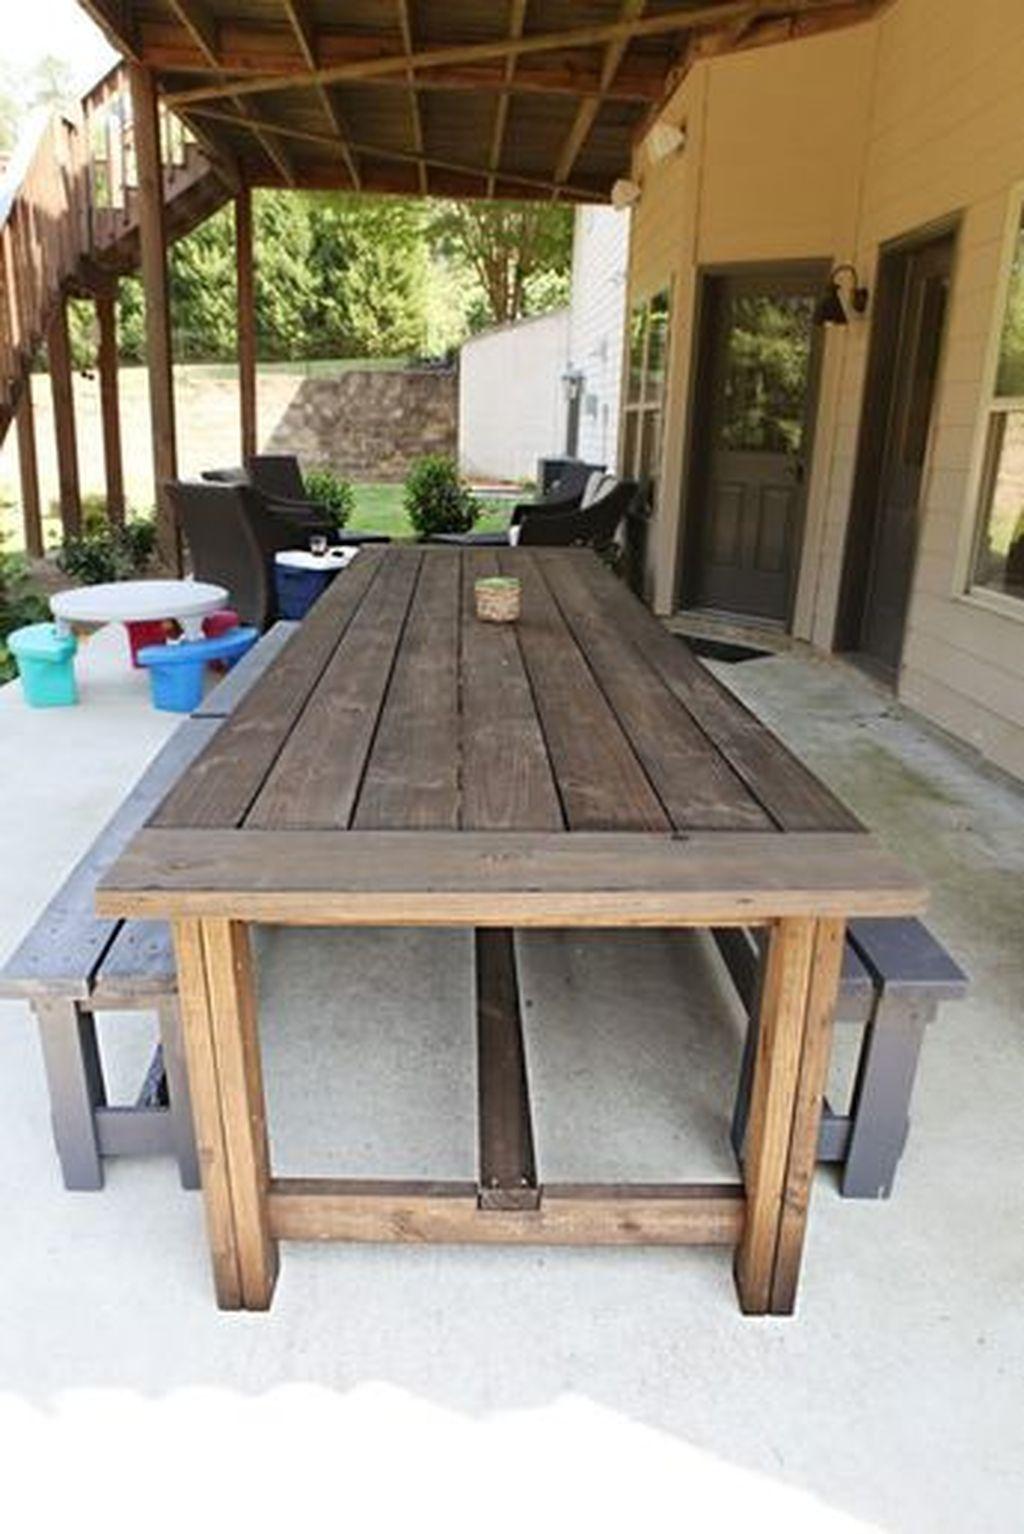 50 Rustic Outdoor Patio Table Design Ideas On A Budget Diy